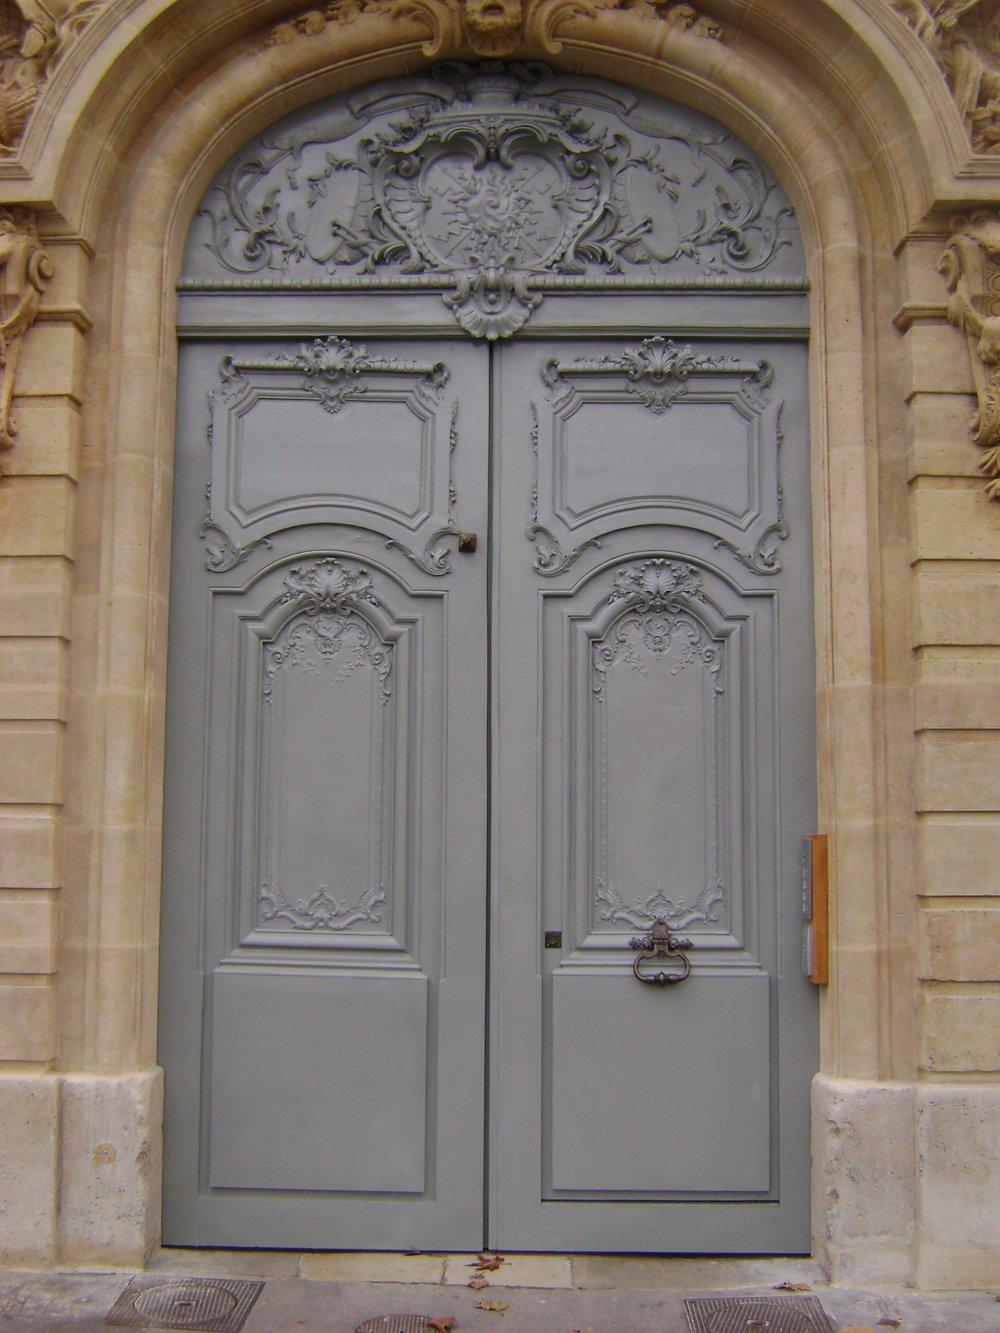 Restoration of 18th century door using linseed paint. Hotel des Gendarmes, VERSAILLES.